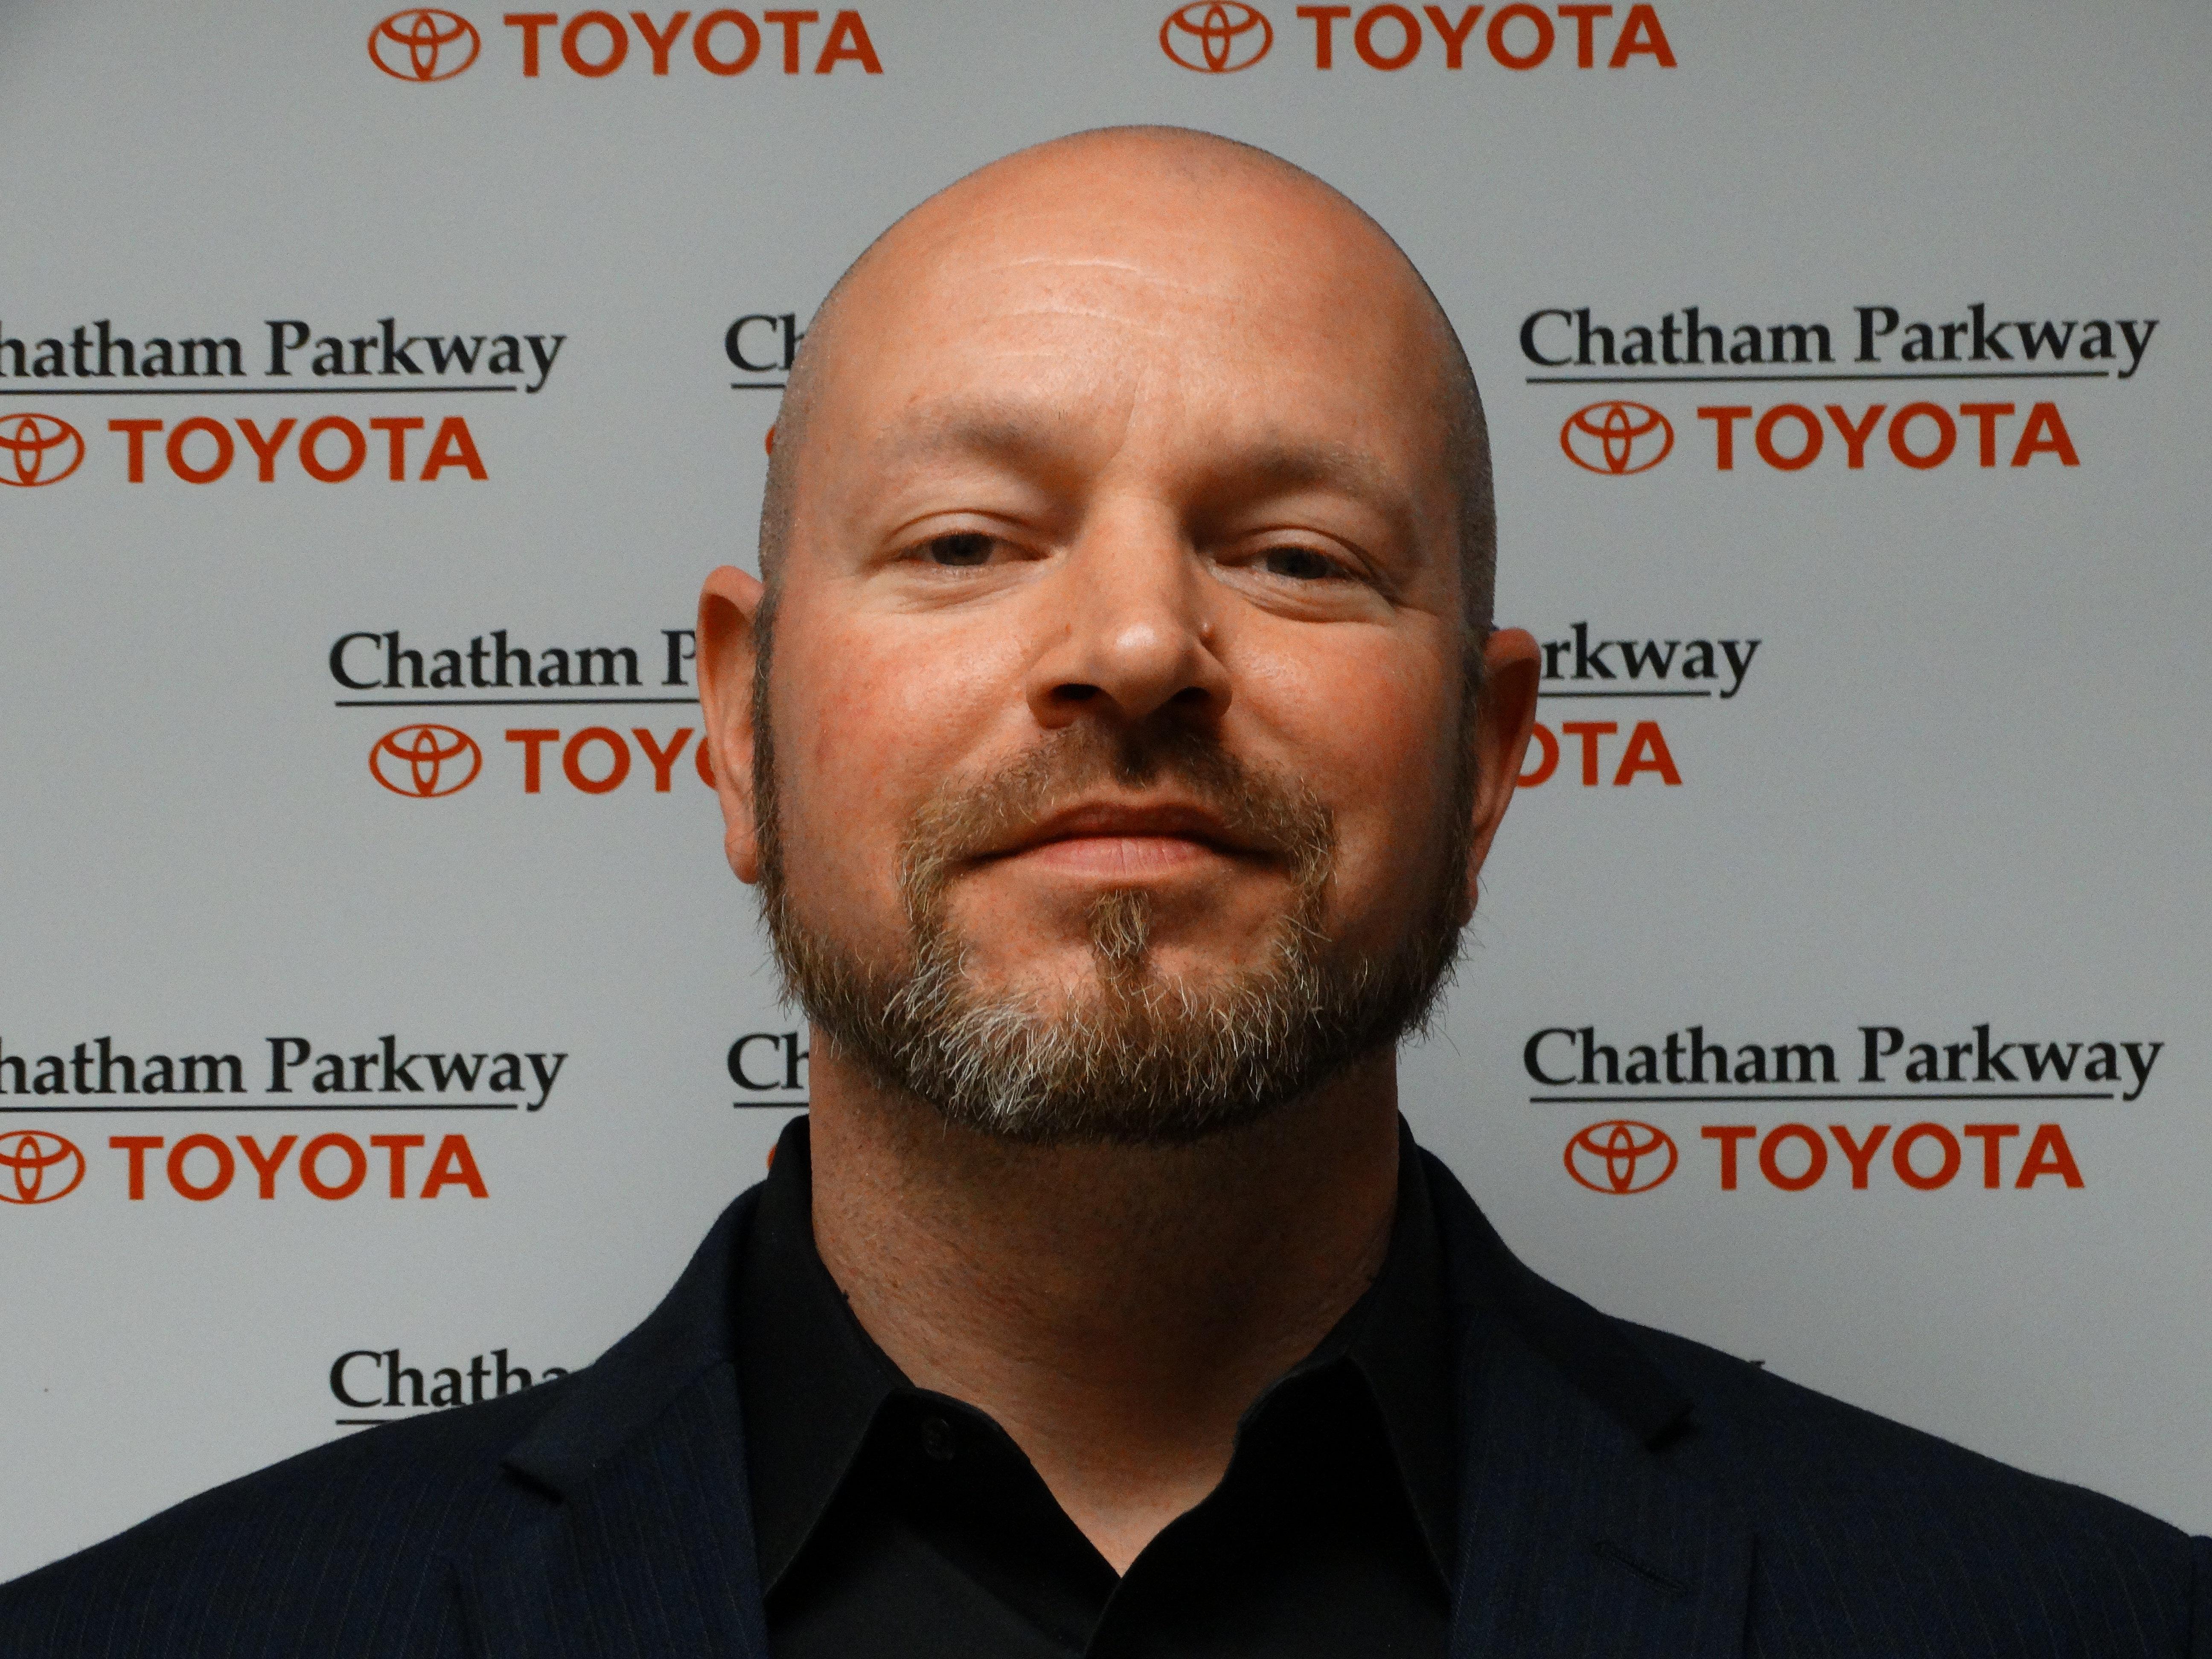 Nicholas Bouchea - Manager